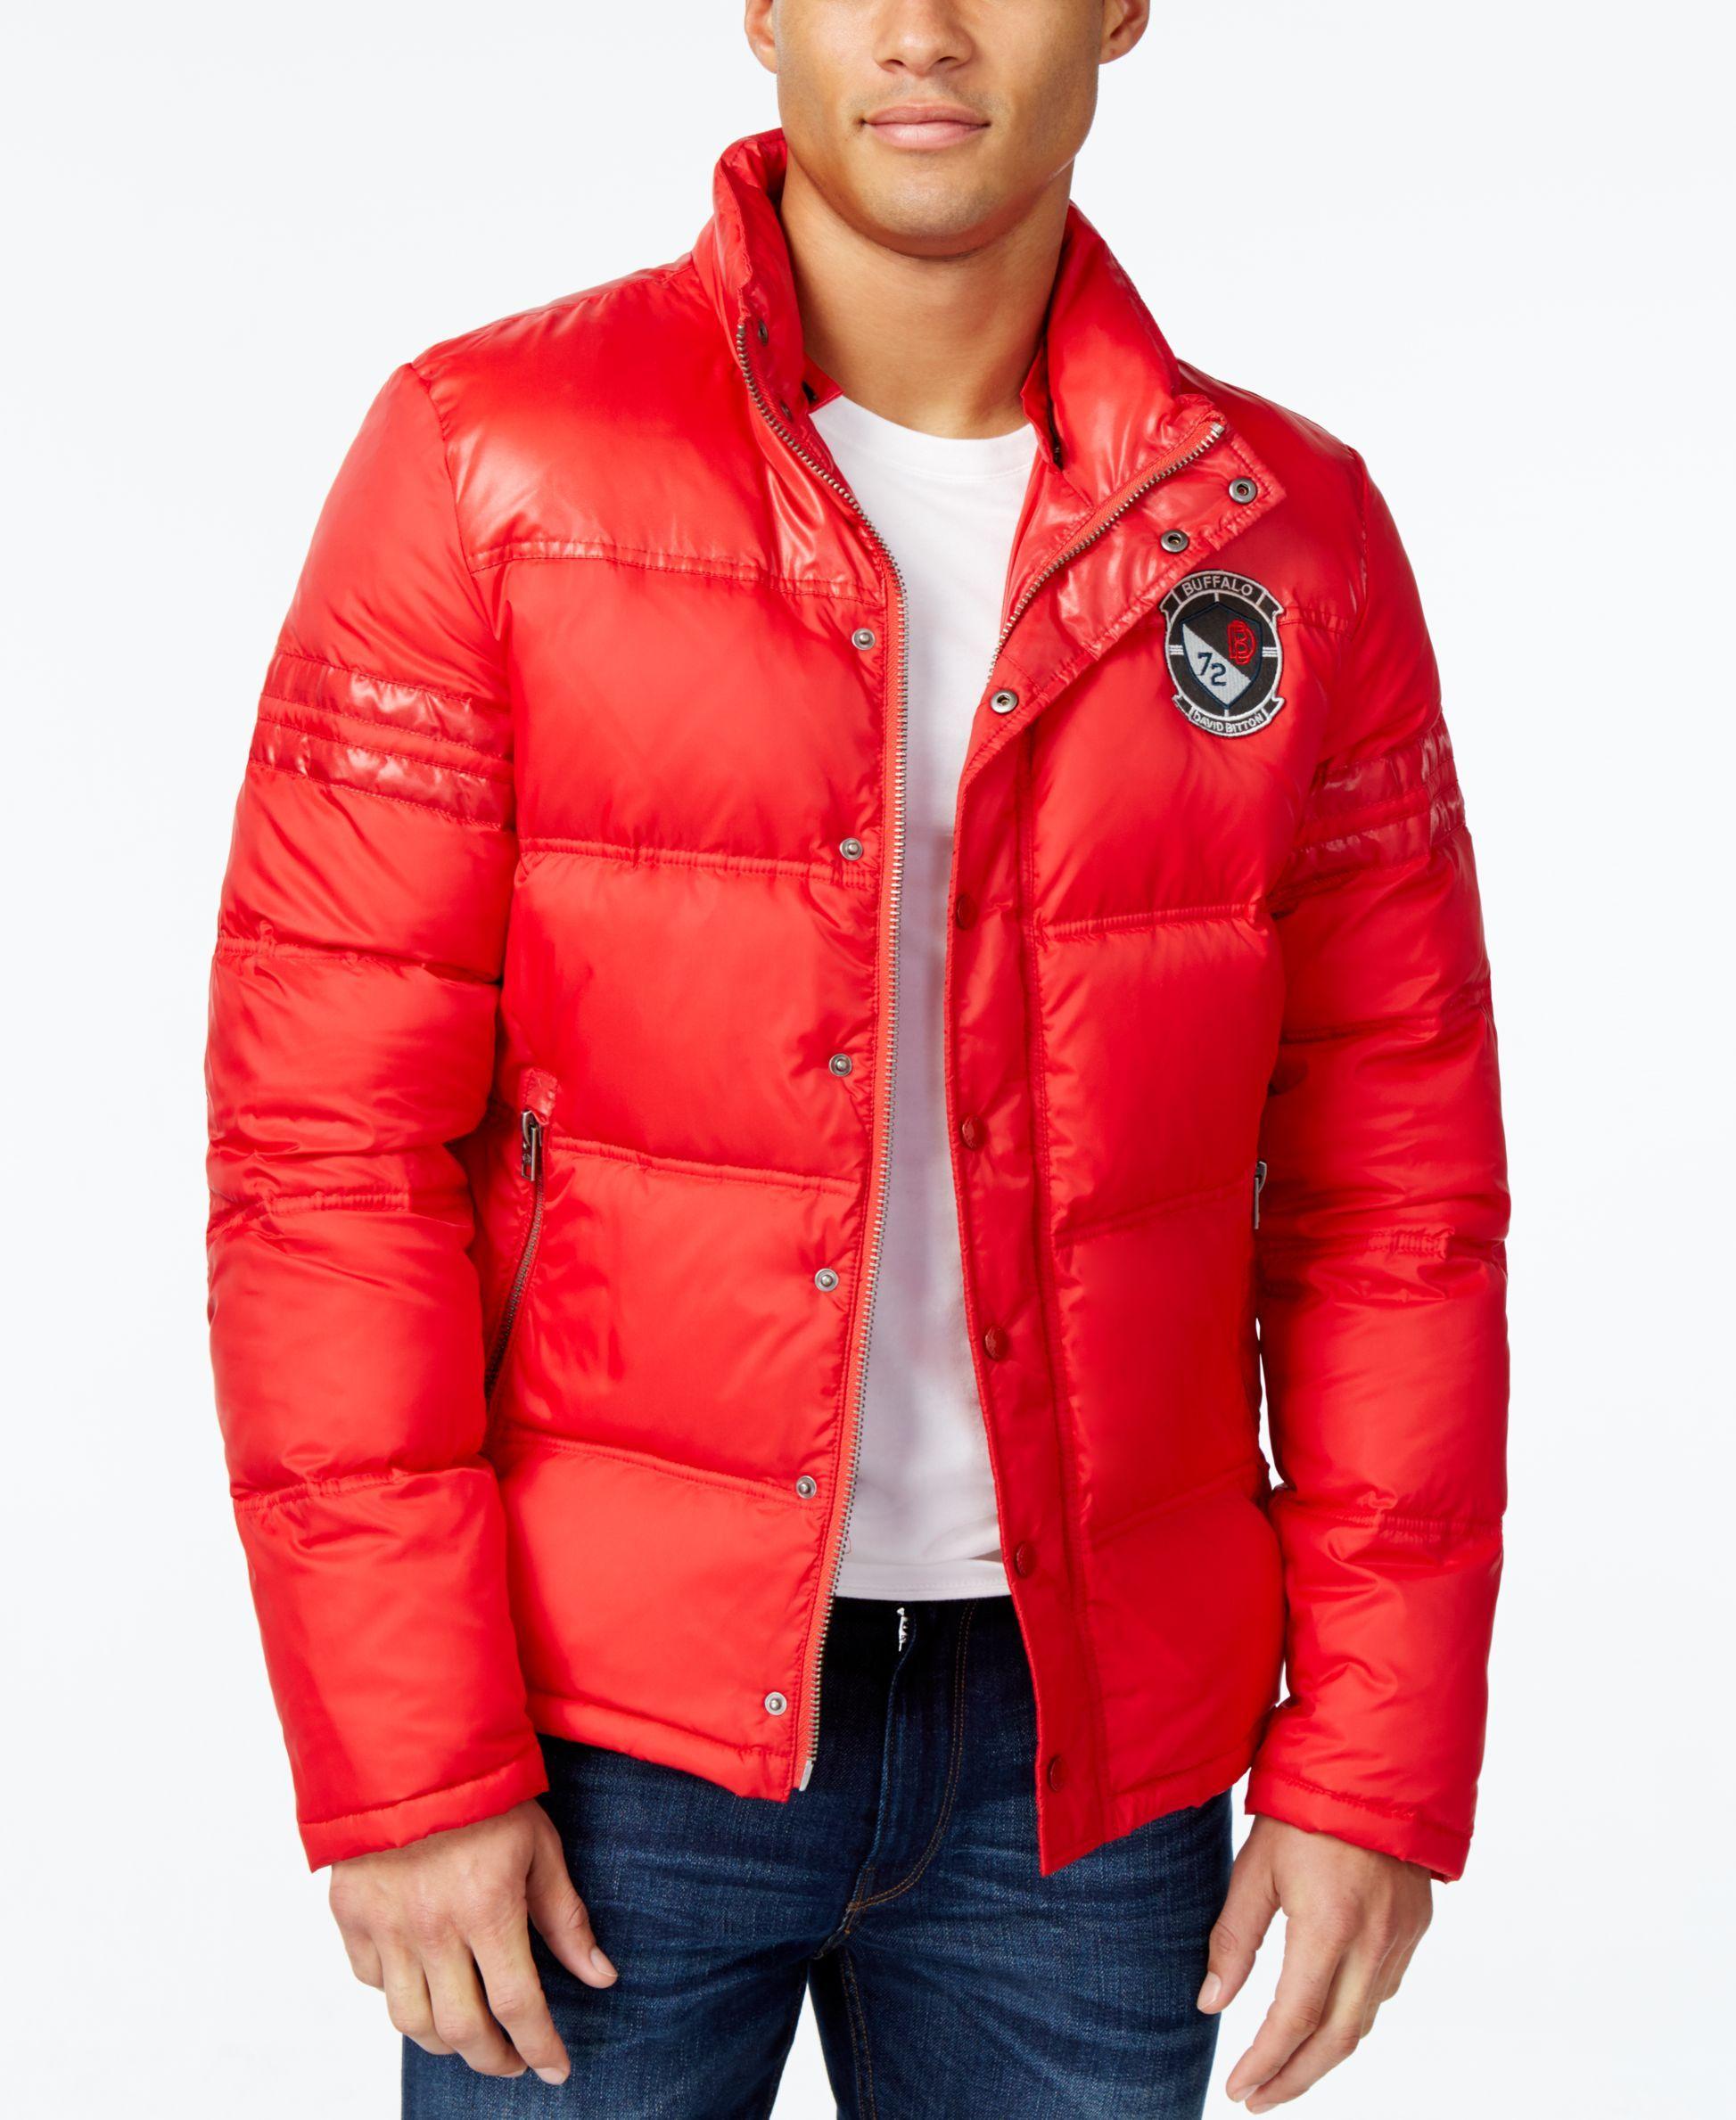 Buffalo David Bitton Men S Compact Puffer Jacket A Macy S Exclusive Style Puffer Jackets Jackets Mens Jackets [ 2378 x 1947 Pixel ]